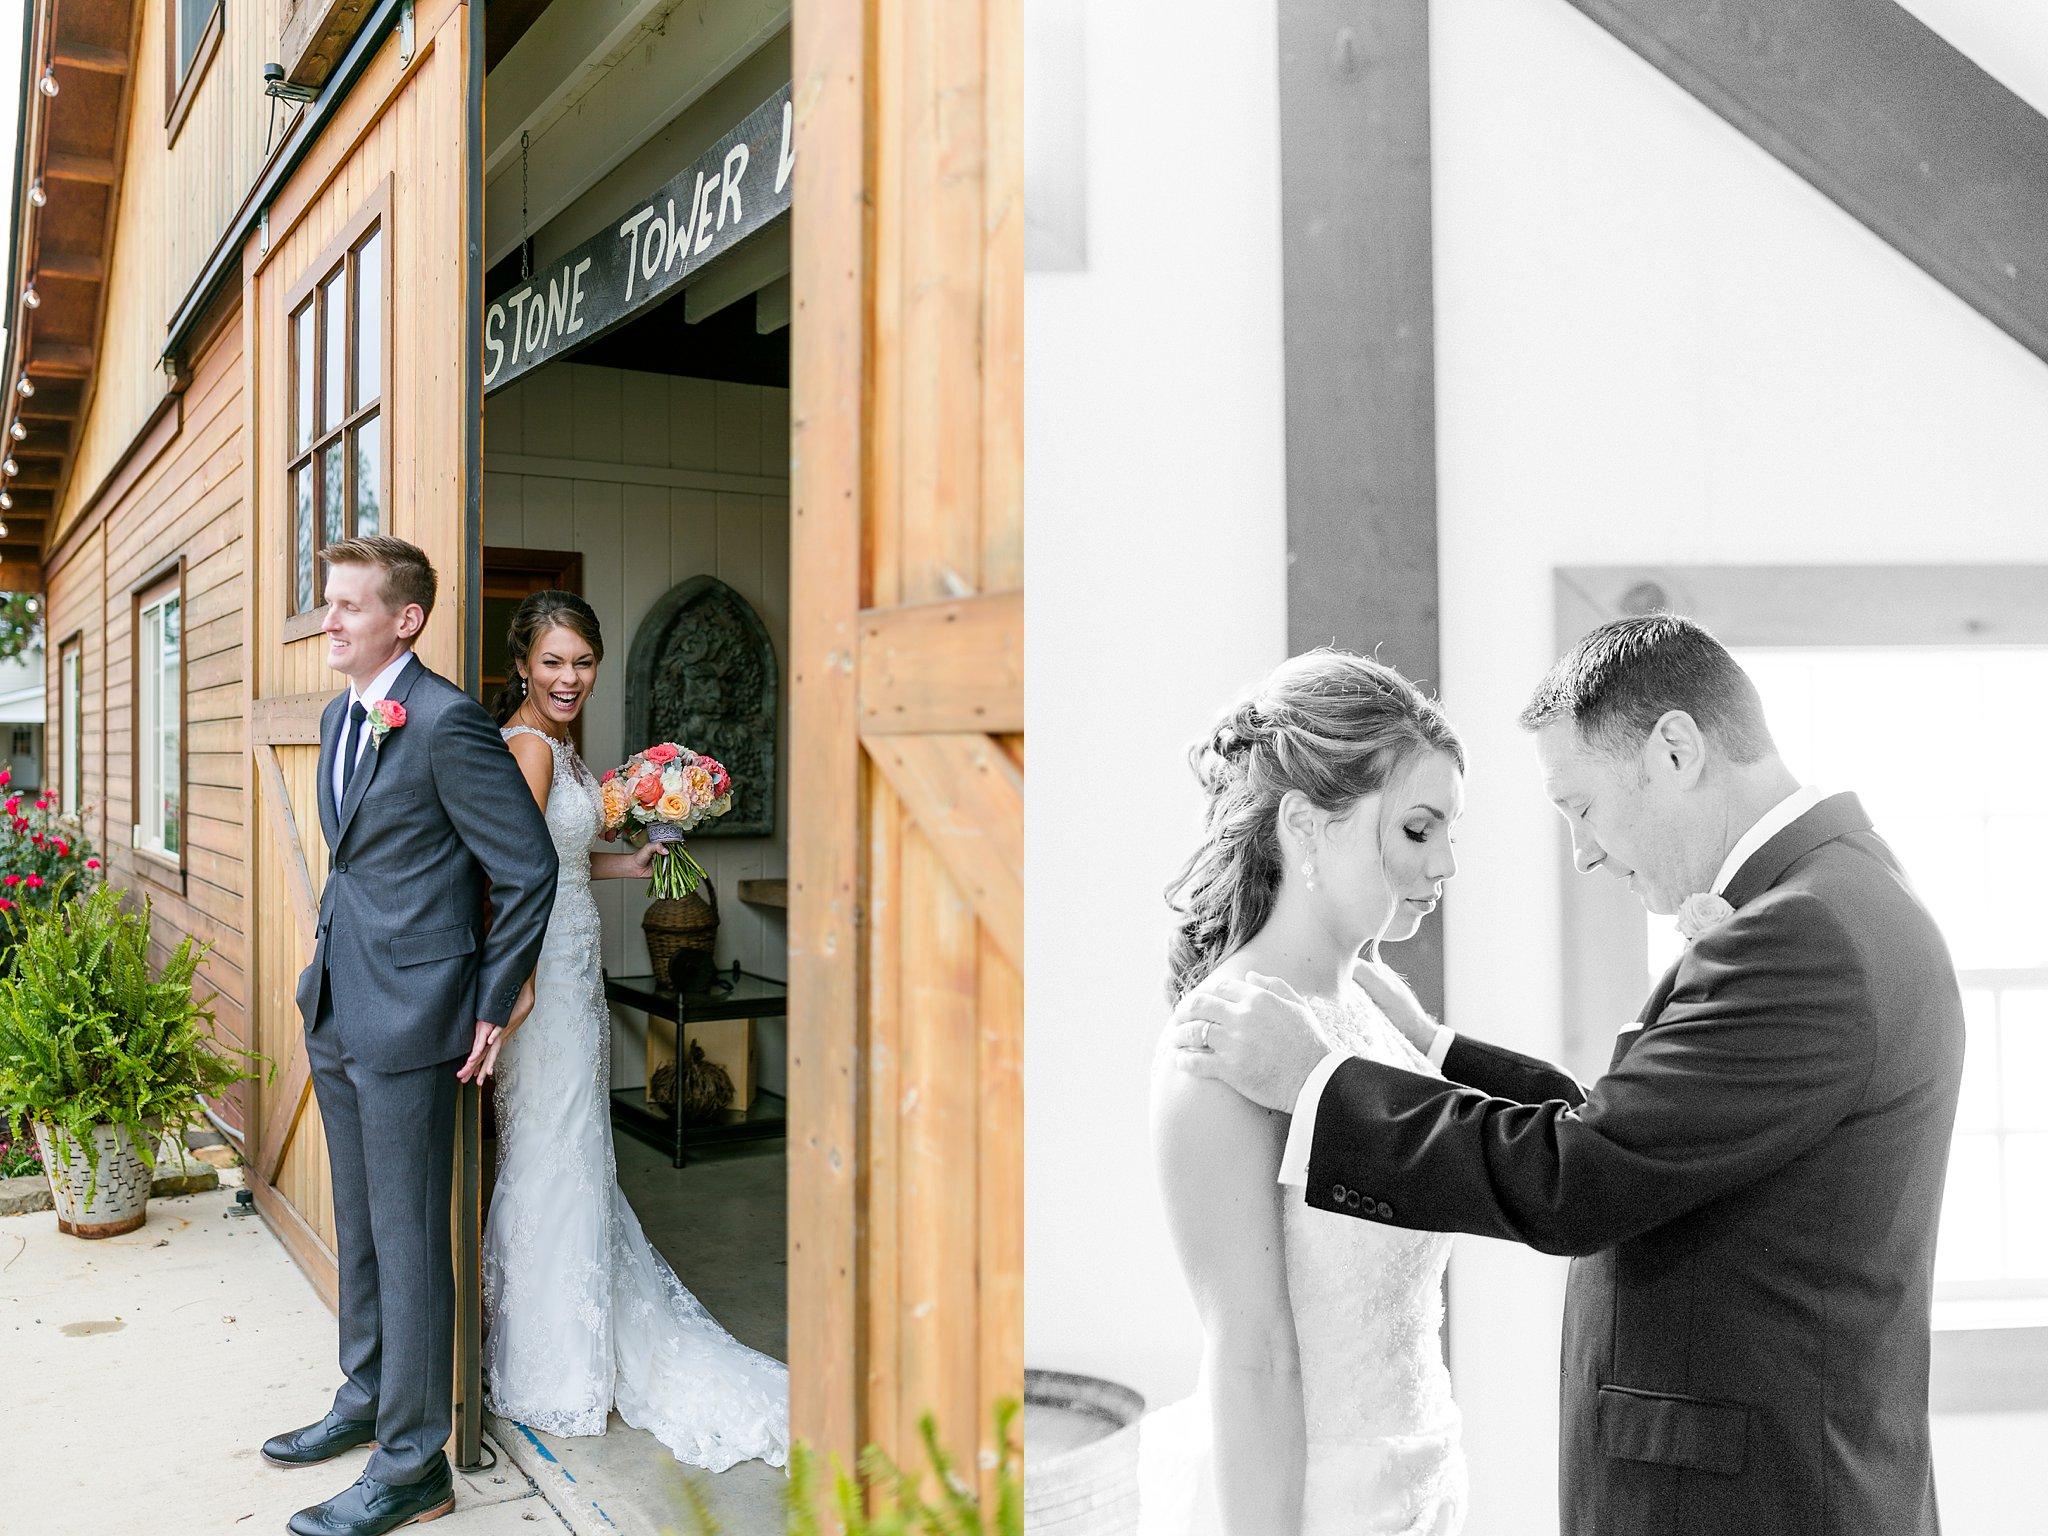 Stone Tower Winery Wedding Photos Virginia Wedding Photographer Megan Kelsey Photography Sam & Angela-135.jpg